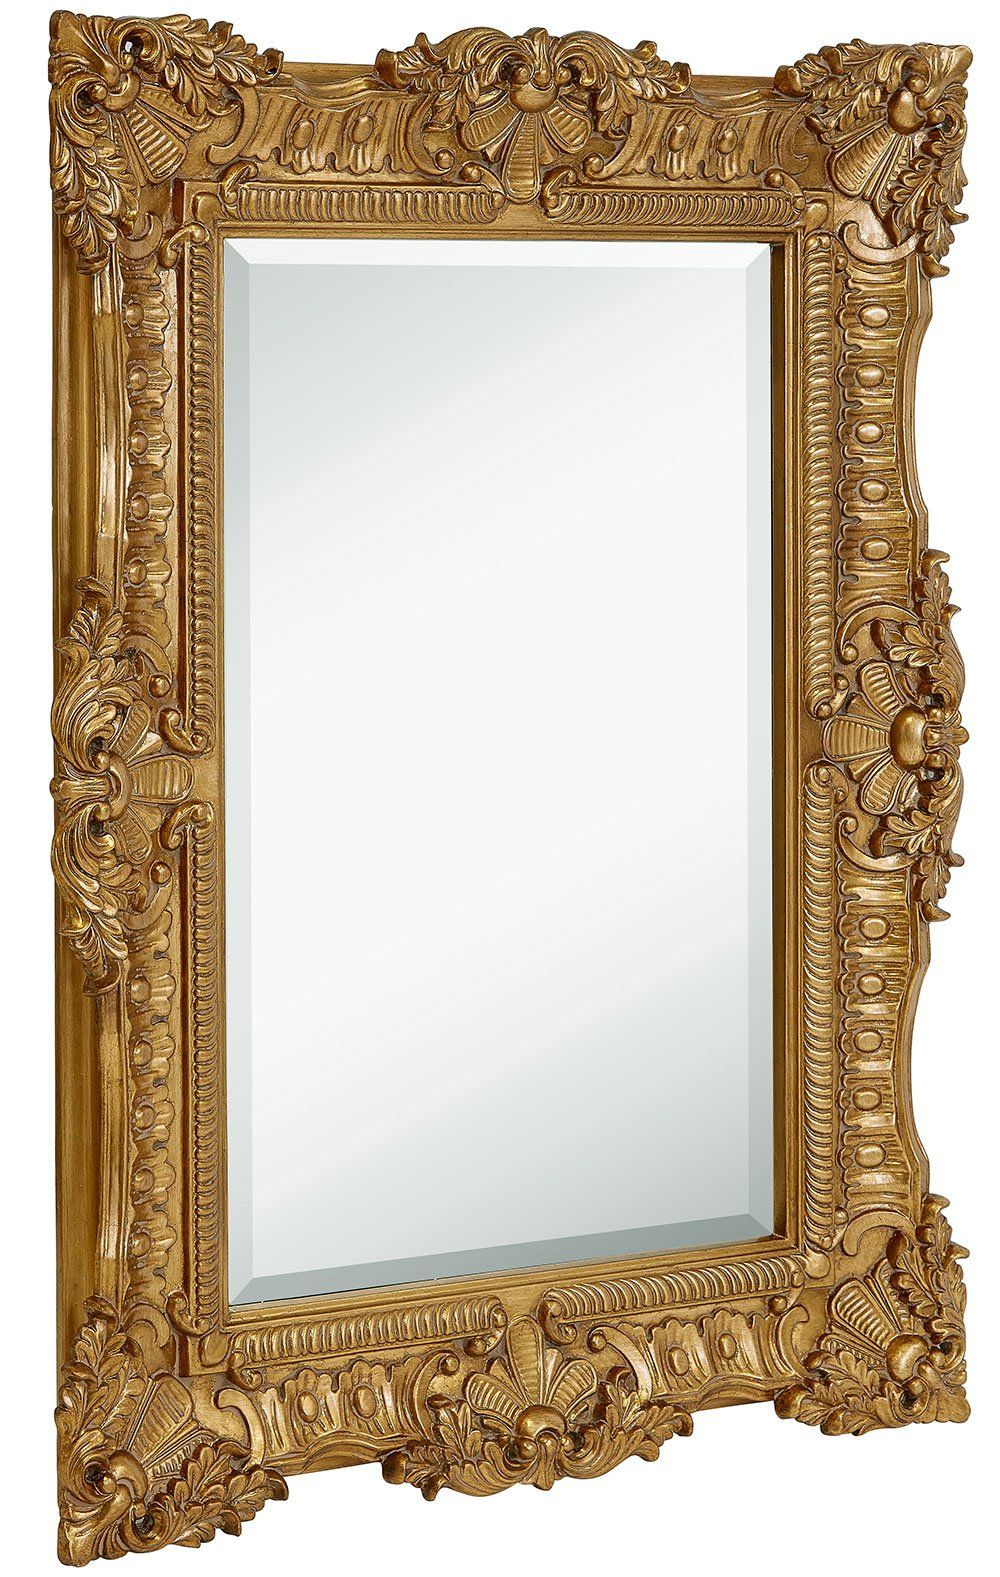 Large Ornate Gold Baroque Frame Mirror | Aged Luxury | Elegant ...